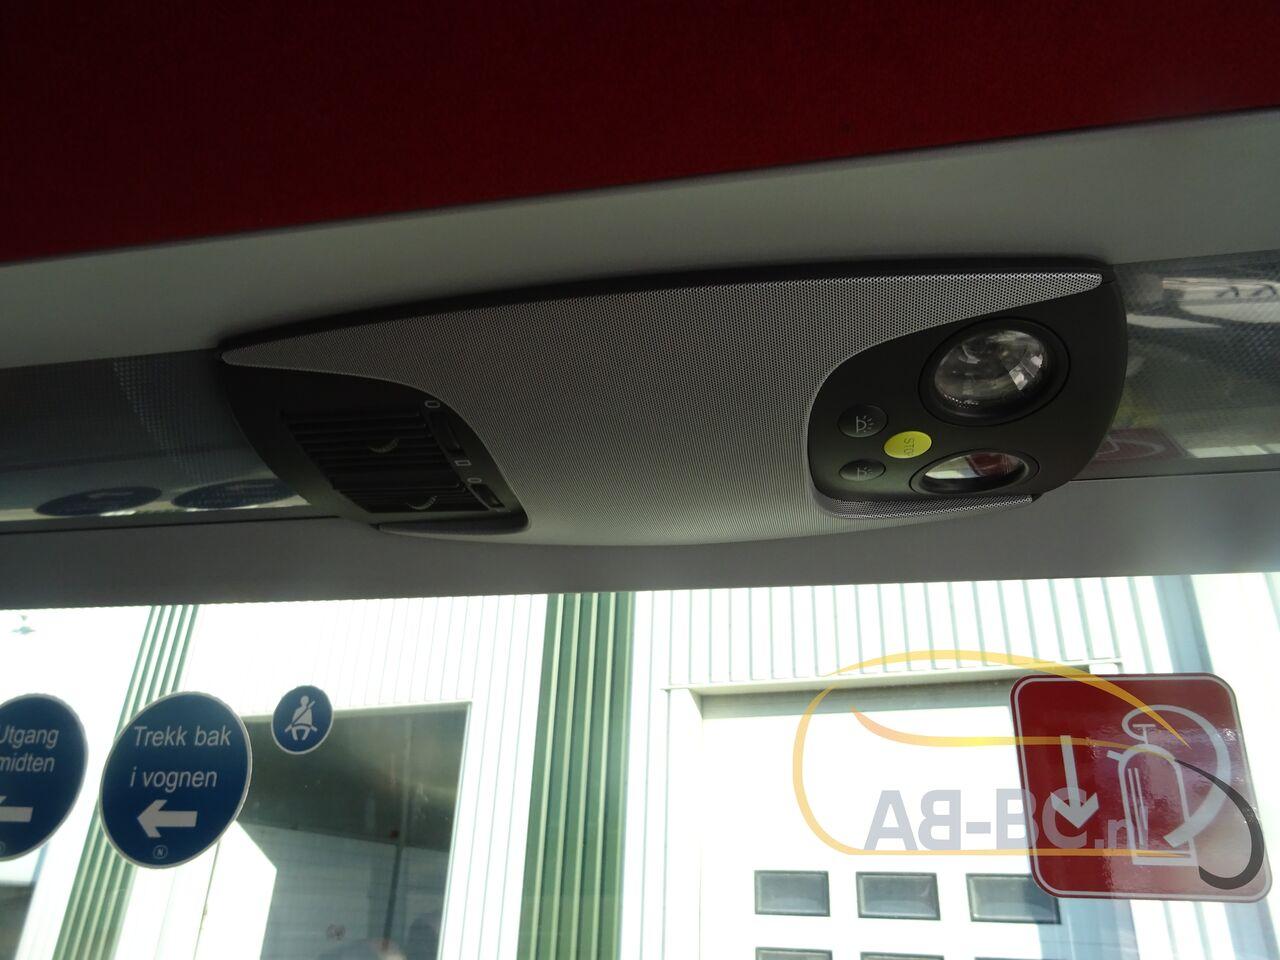 coach-bus-SETRA-S415H-52-Seats-EURO-6-Liftbus---1630913375065675059_big_246048138bd40380a7f43203c3e303a5--21070517141280735500